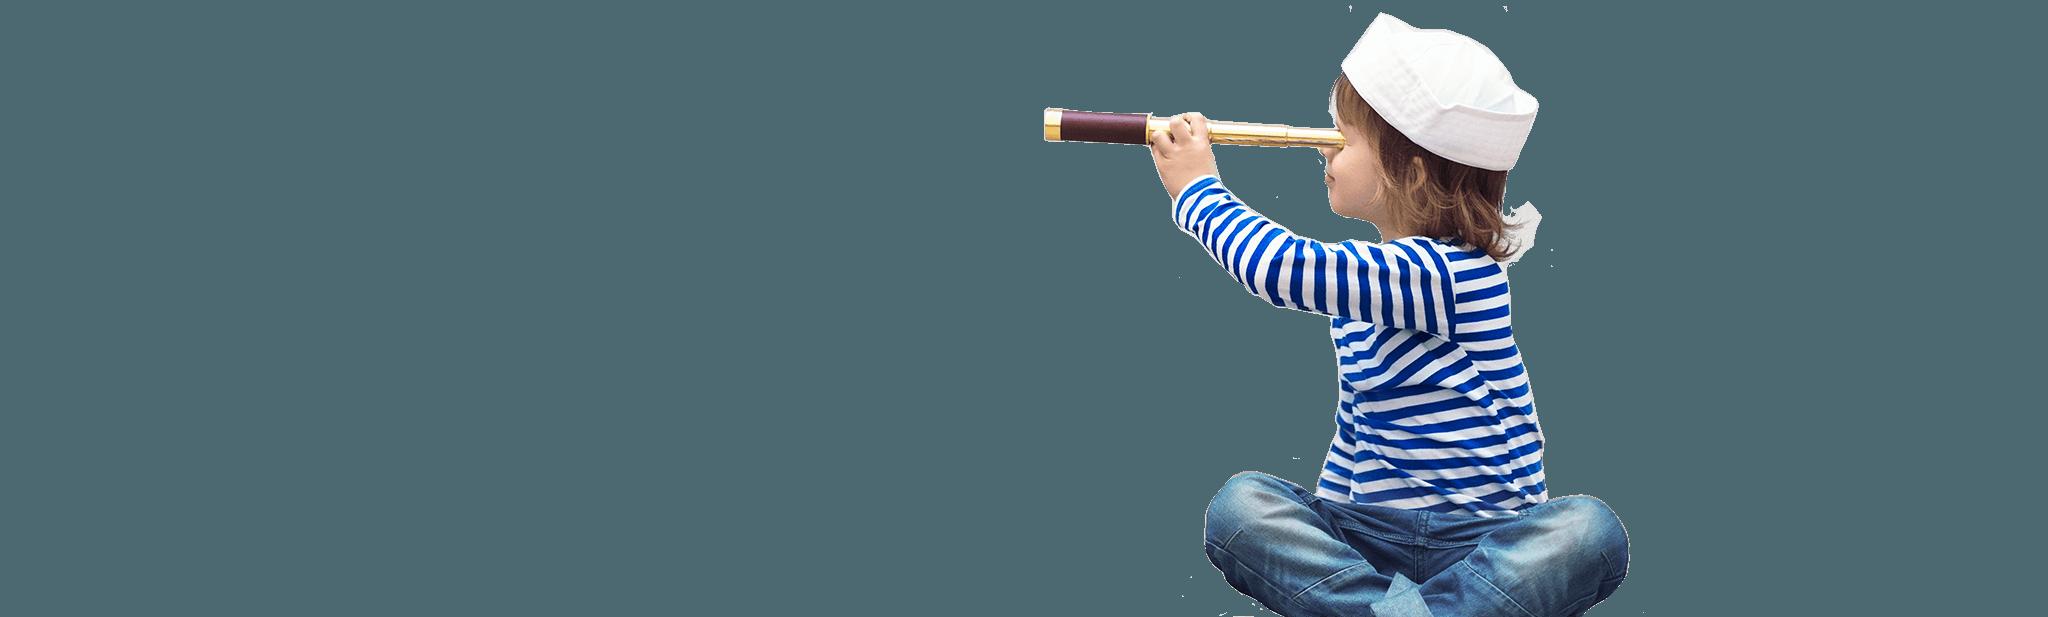 http://skivesejlklub.dk/wp-content/uploads/2019/03/child-in-uniform-PPA8QNY.png